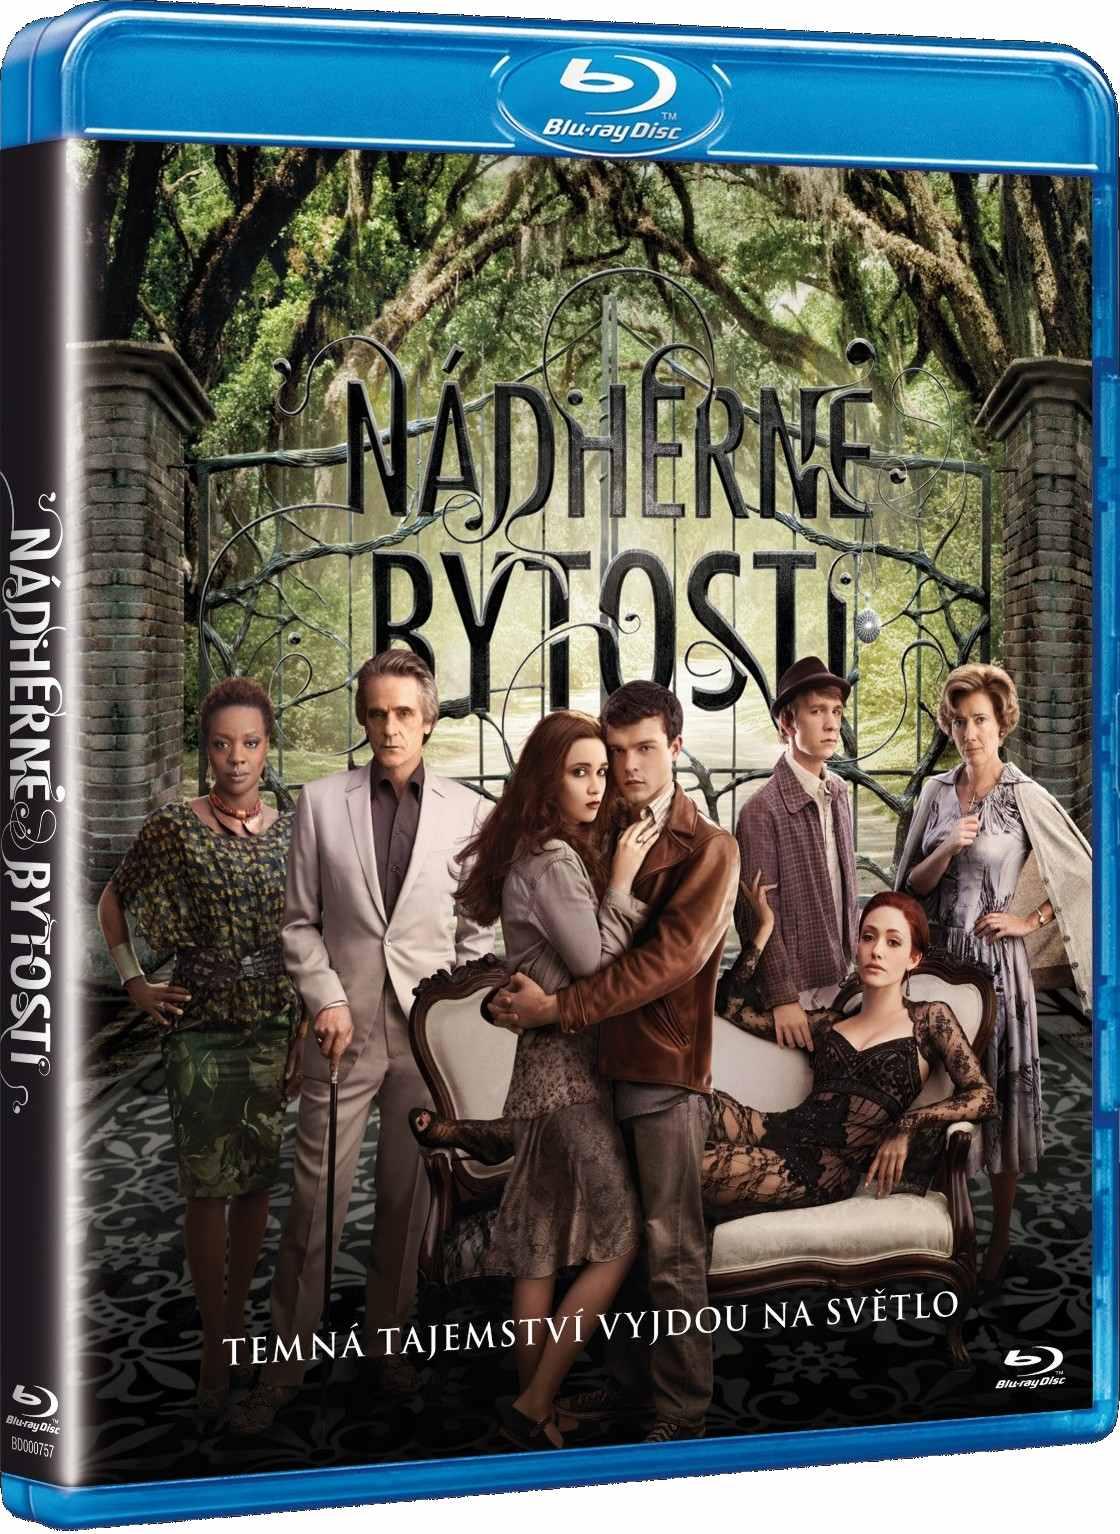 NÁDHERNÉ BYTOSTI - Blu-ray